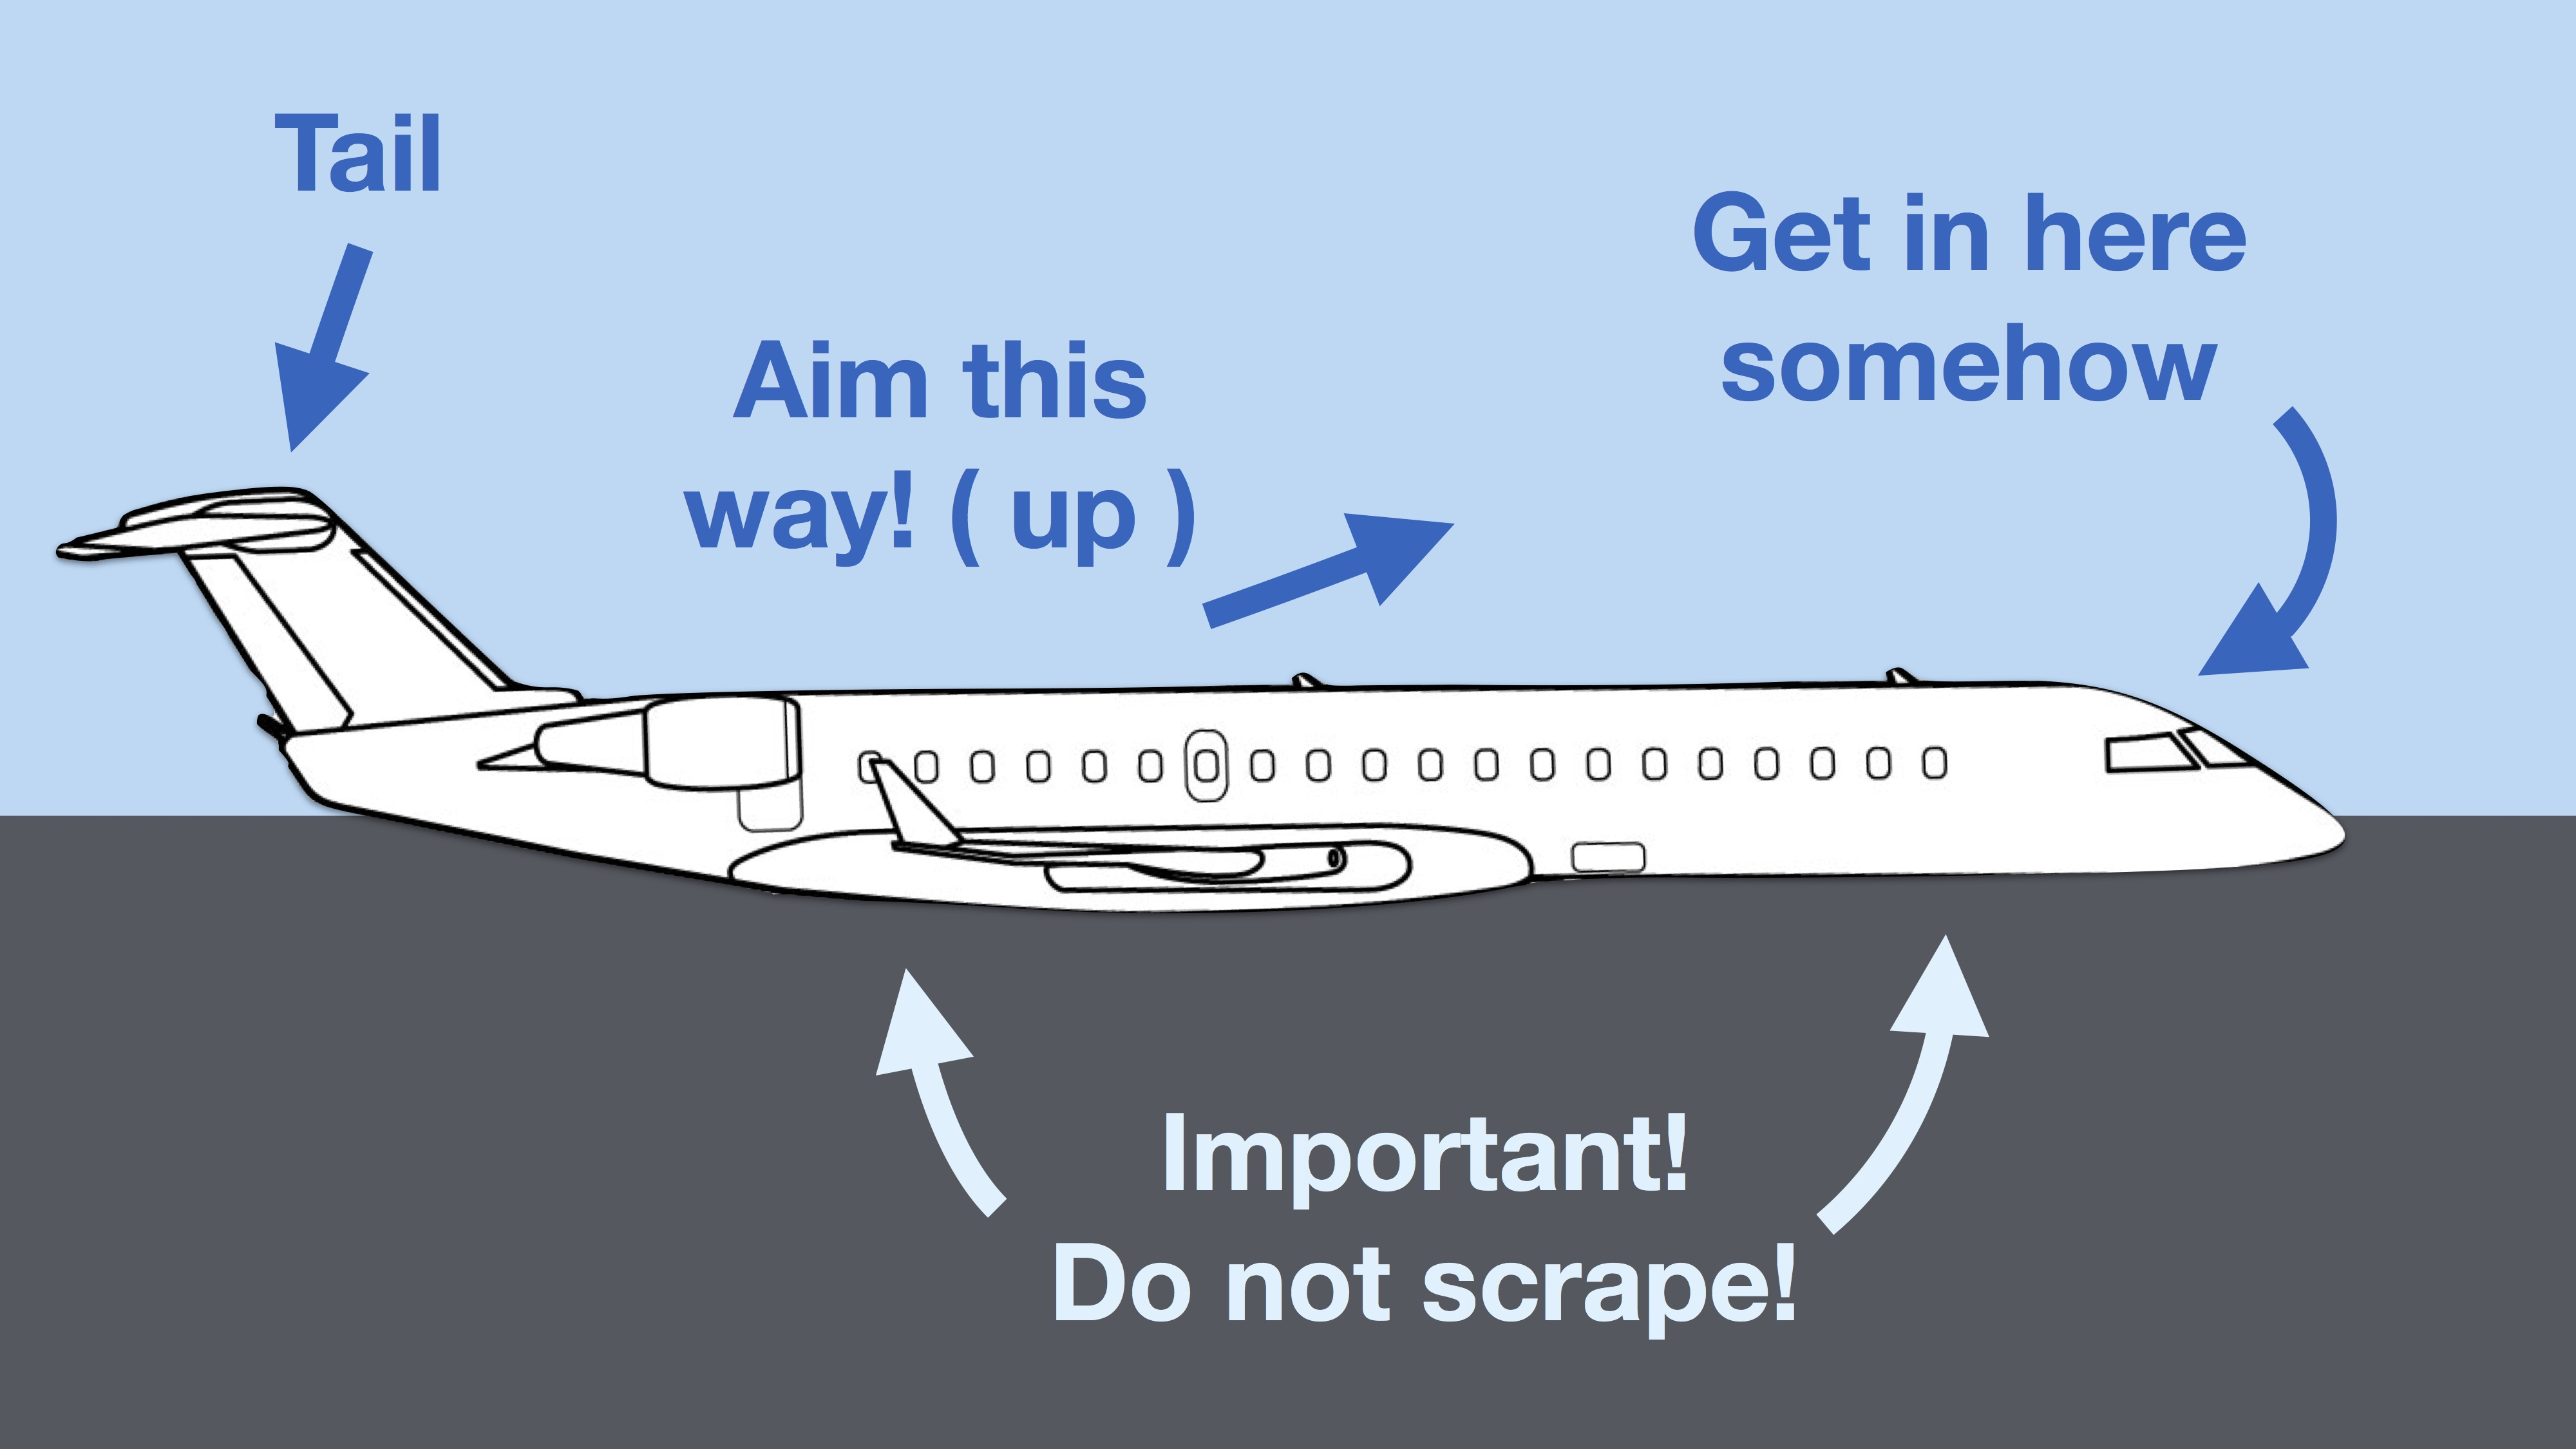 Plane-tool-tip